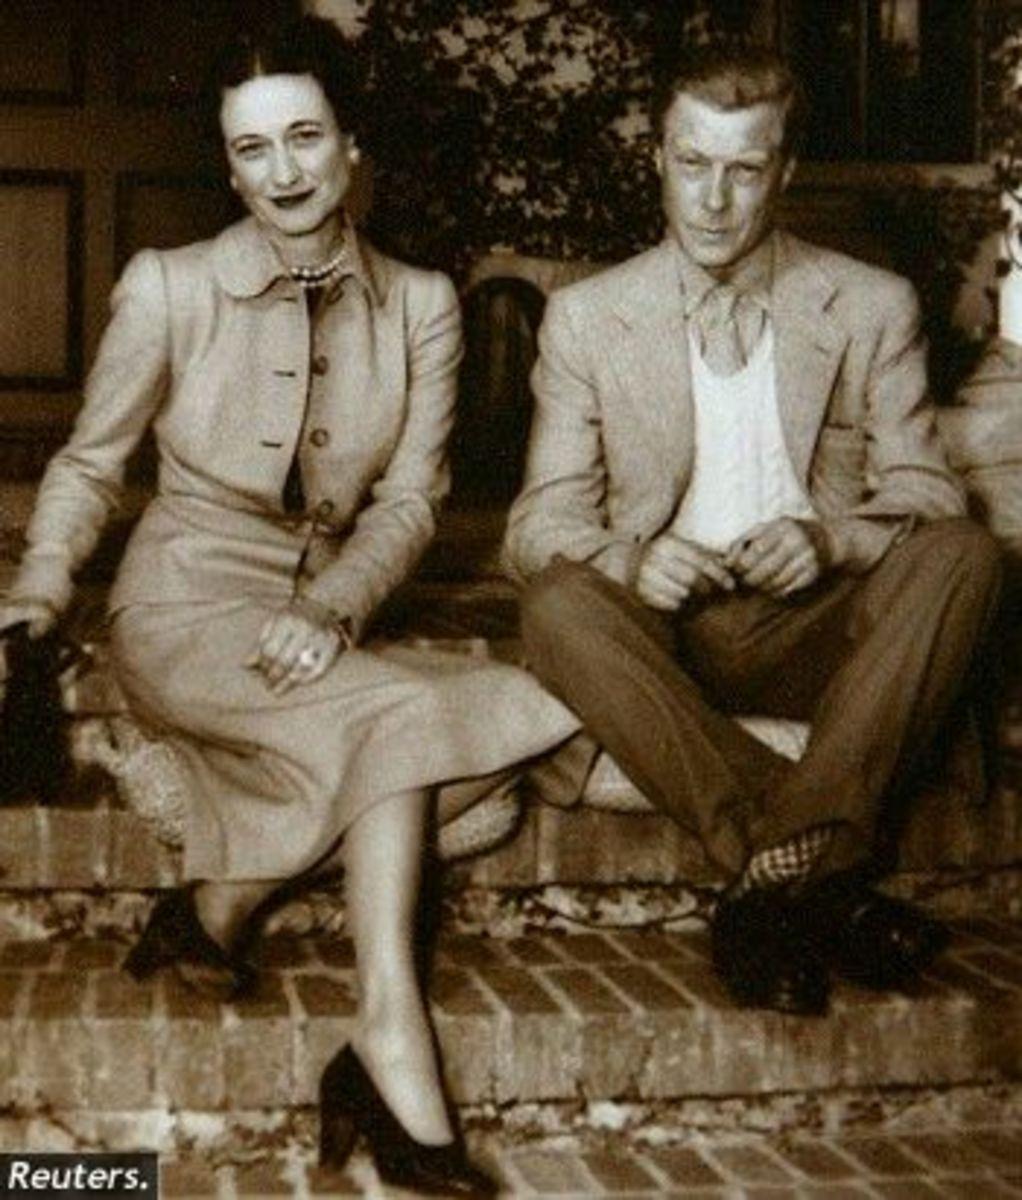 Wallis and Edward. The Duke and Duchess of Windsor